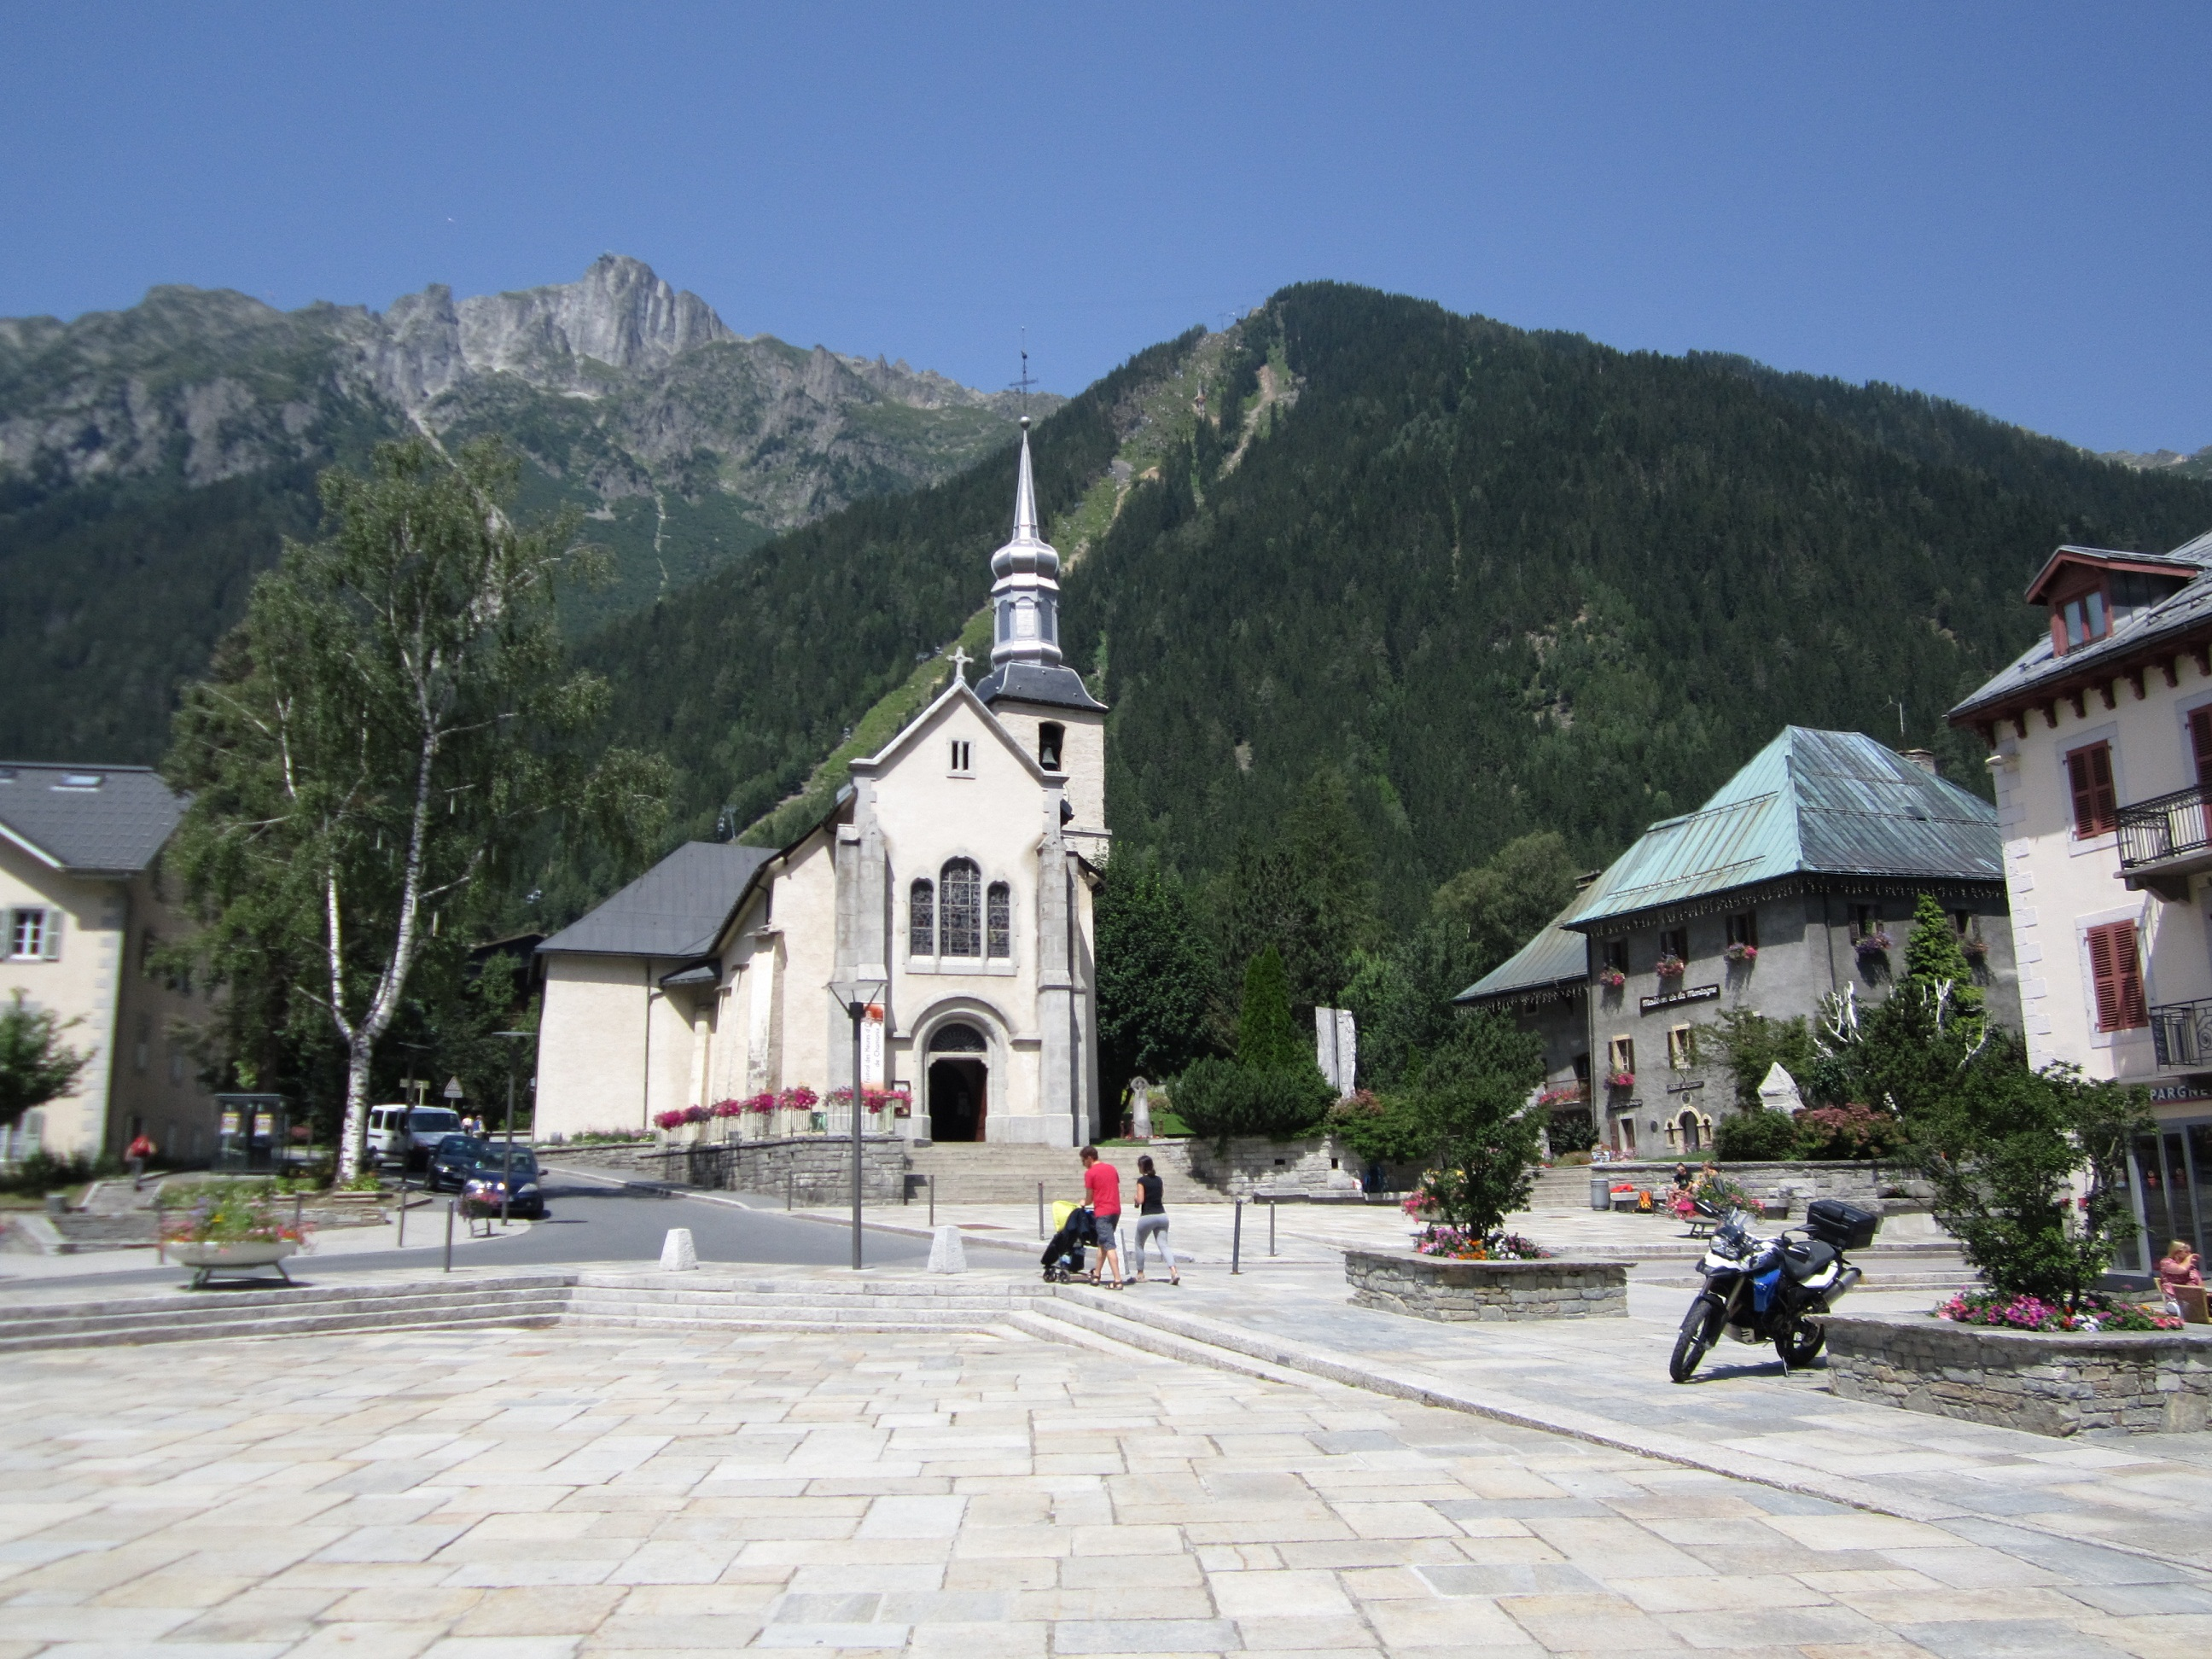 Chamonix, biserica de recorduri (2012)